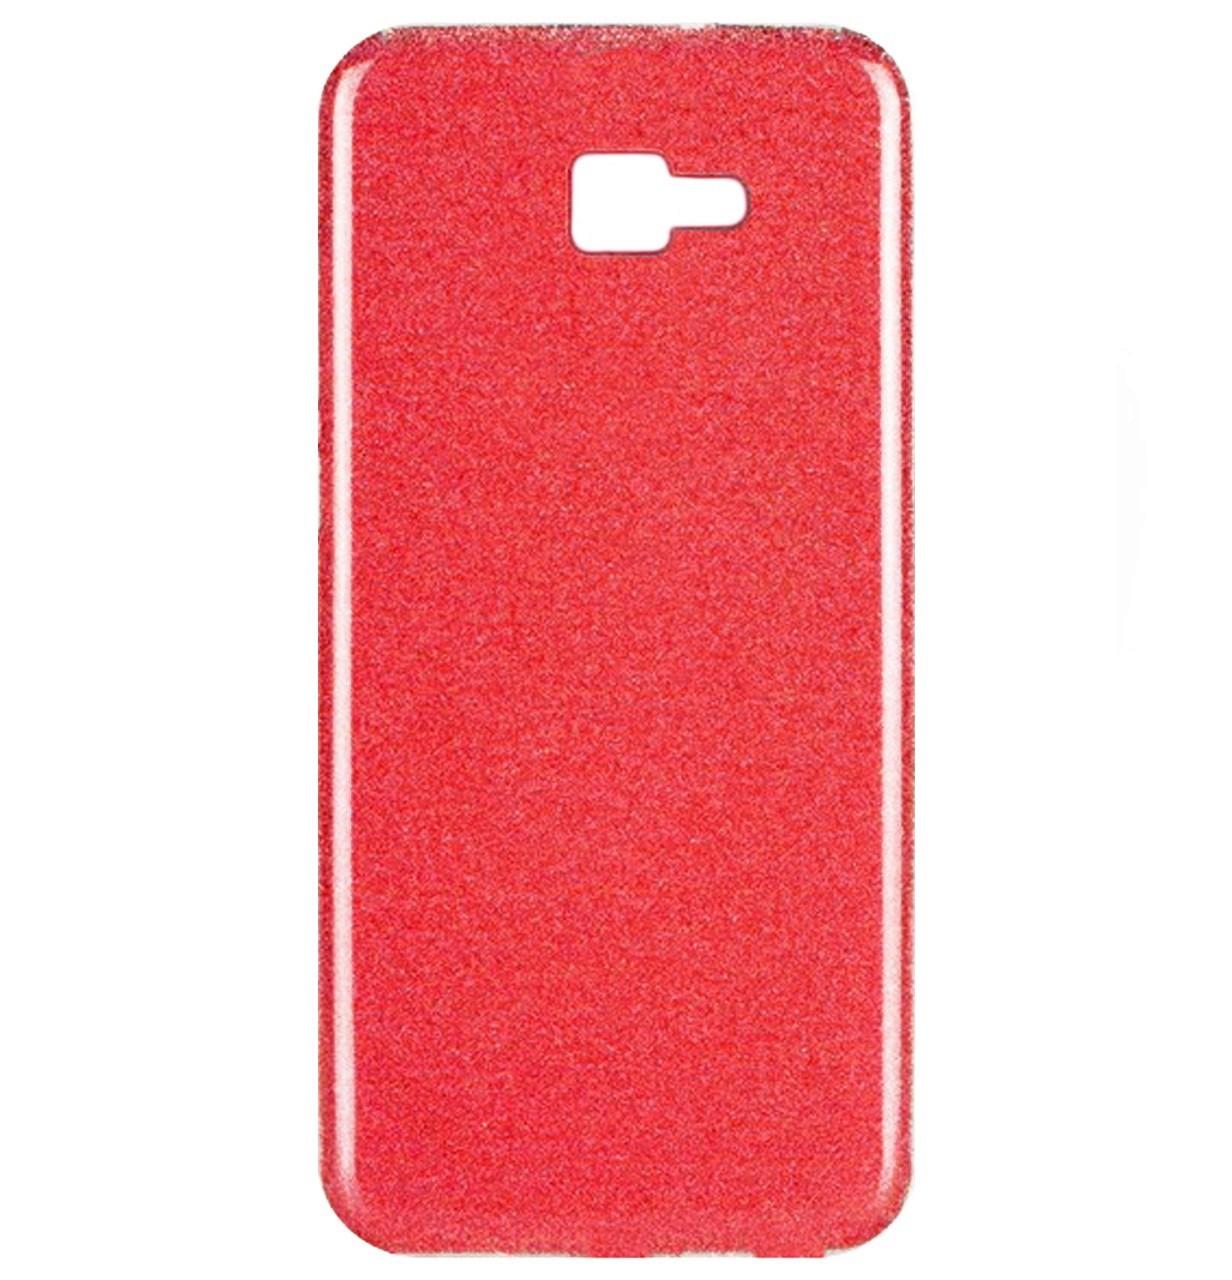 Чехол-накладка TPU Shine для Samsung Galaxy J4 Plus (2018) SM-J415F Red